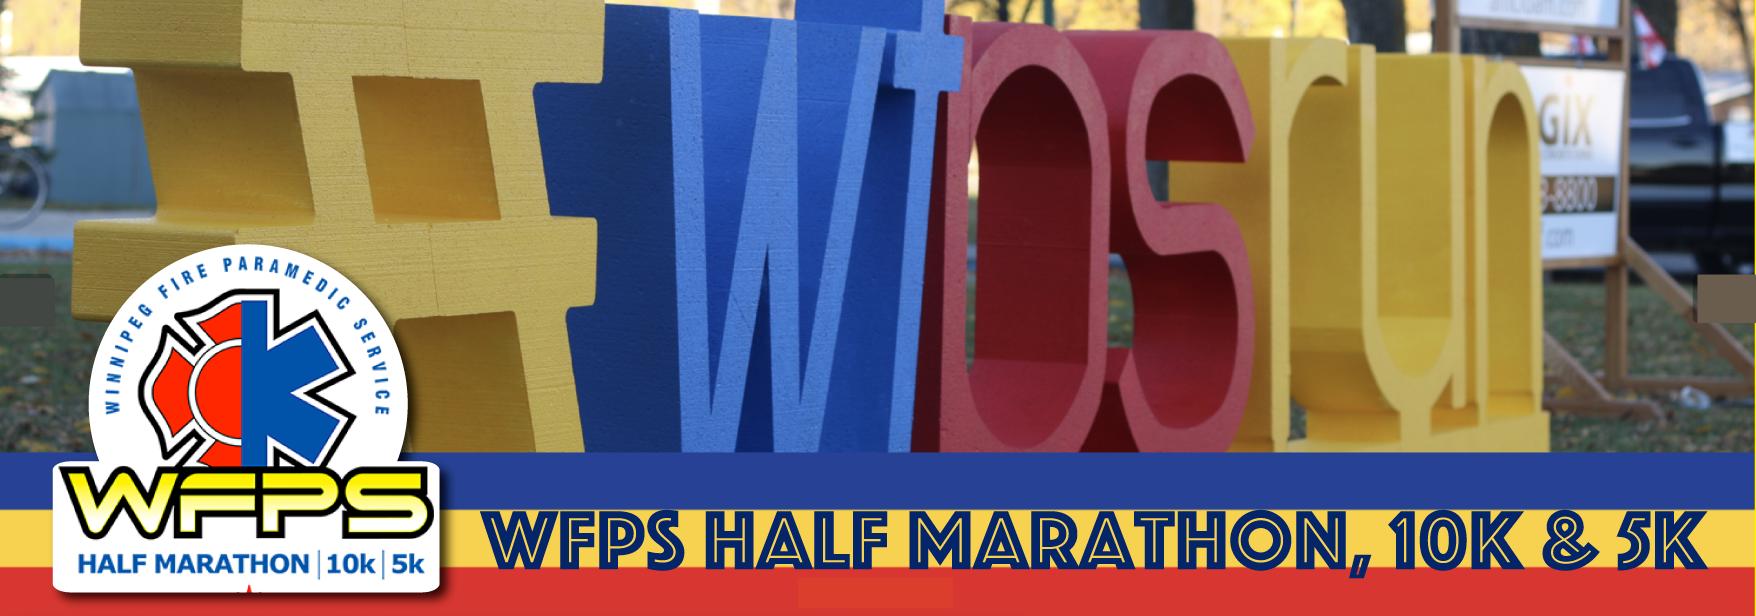 manitoba-runners-association-wfps